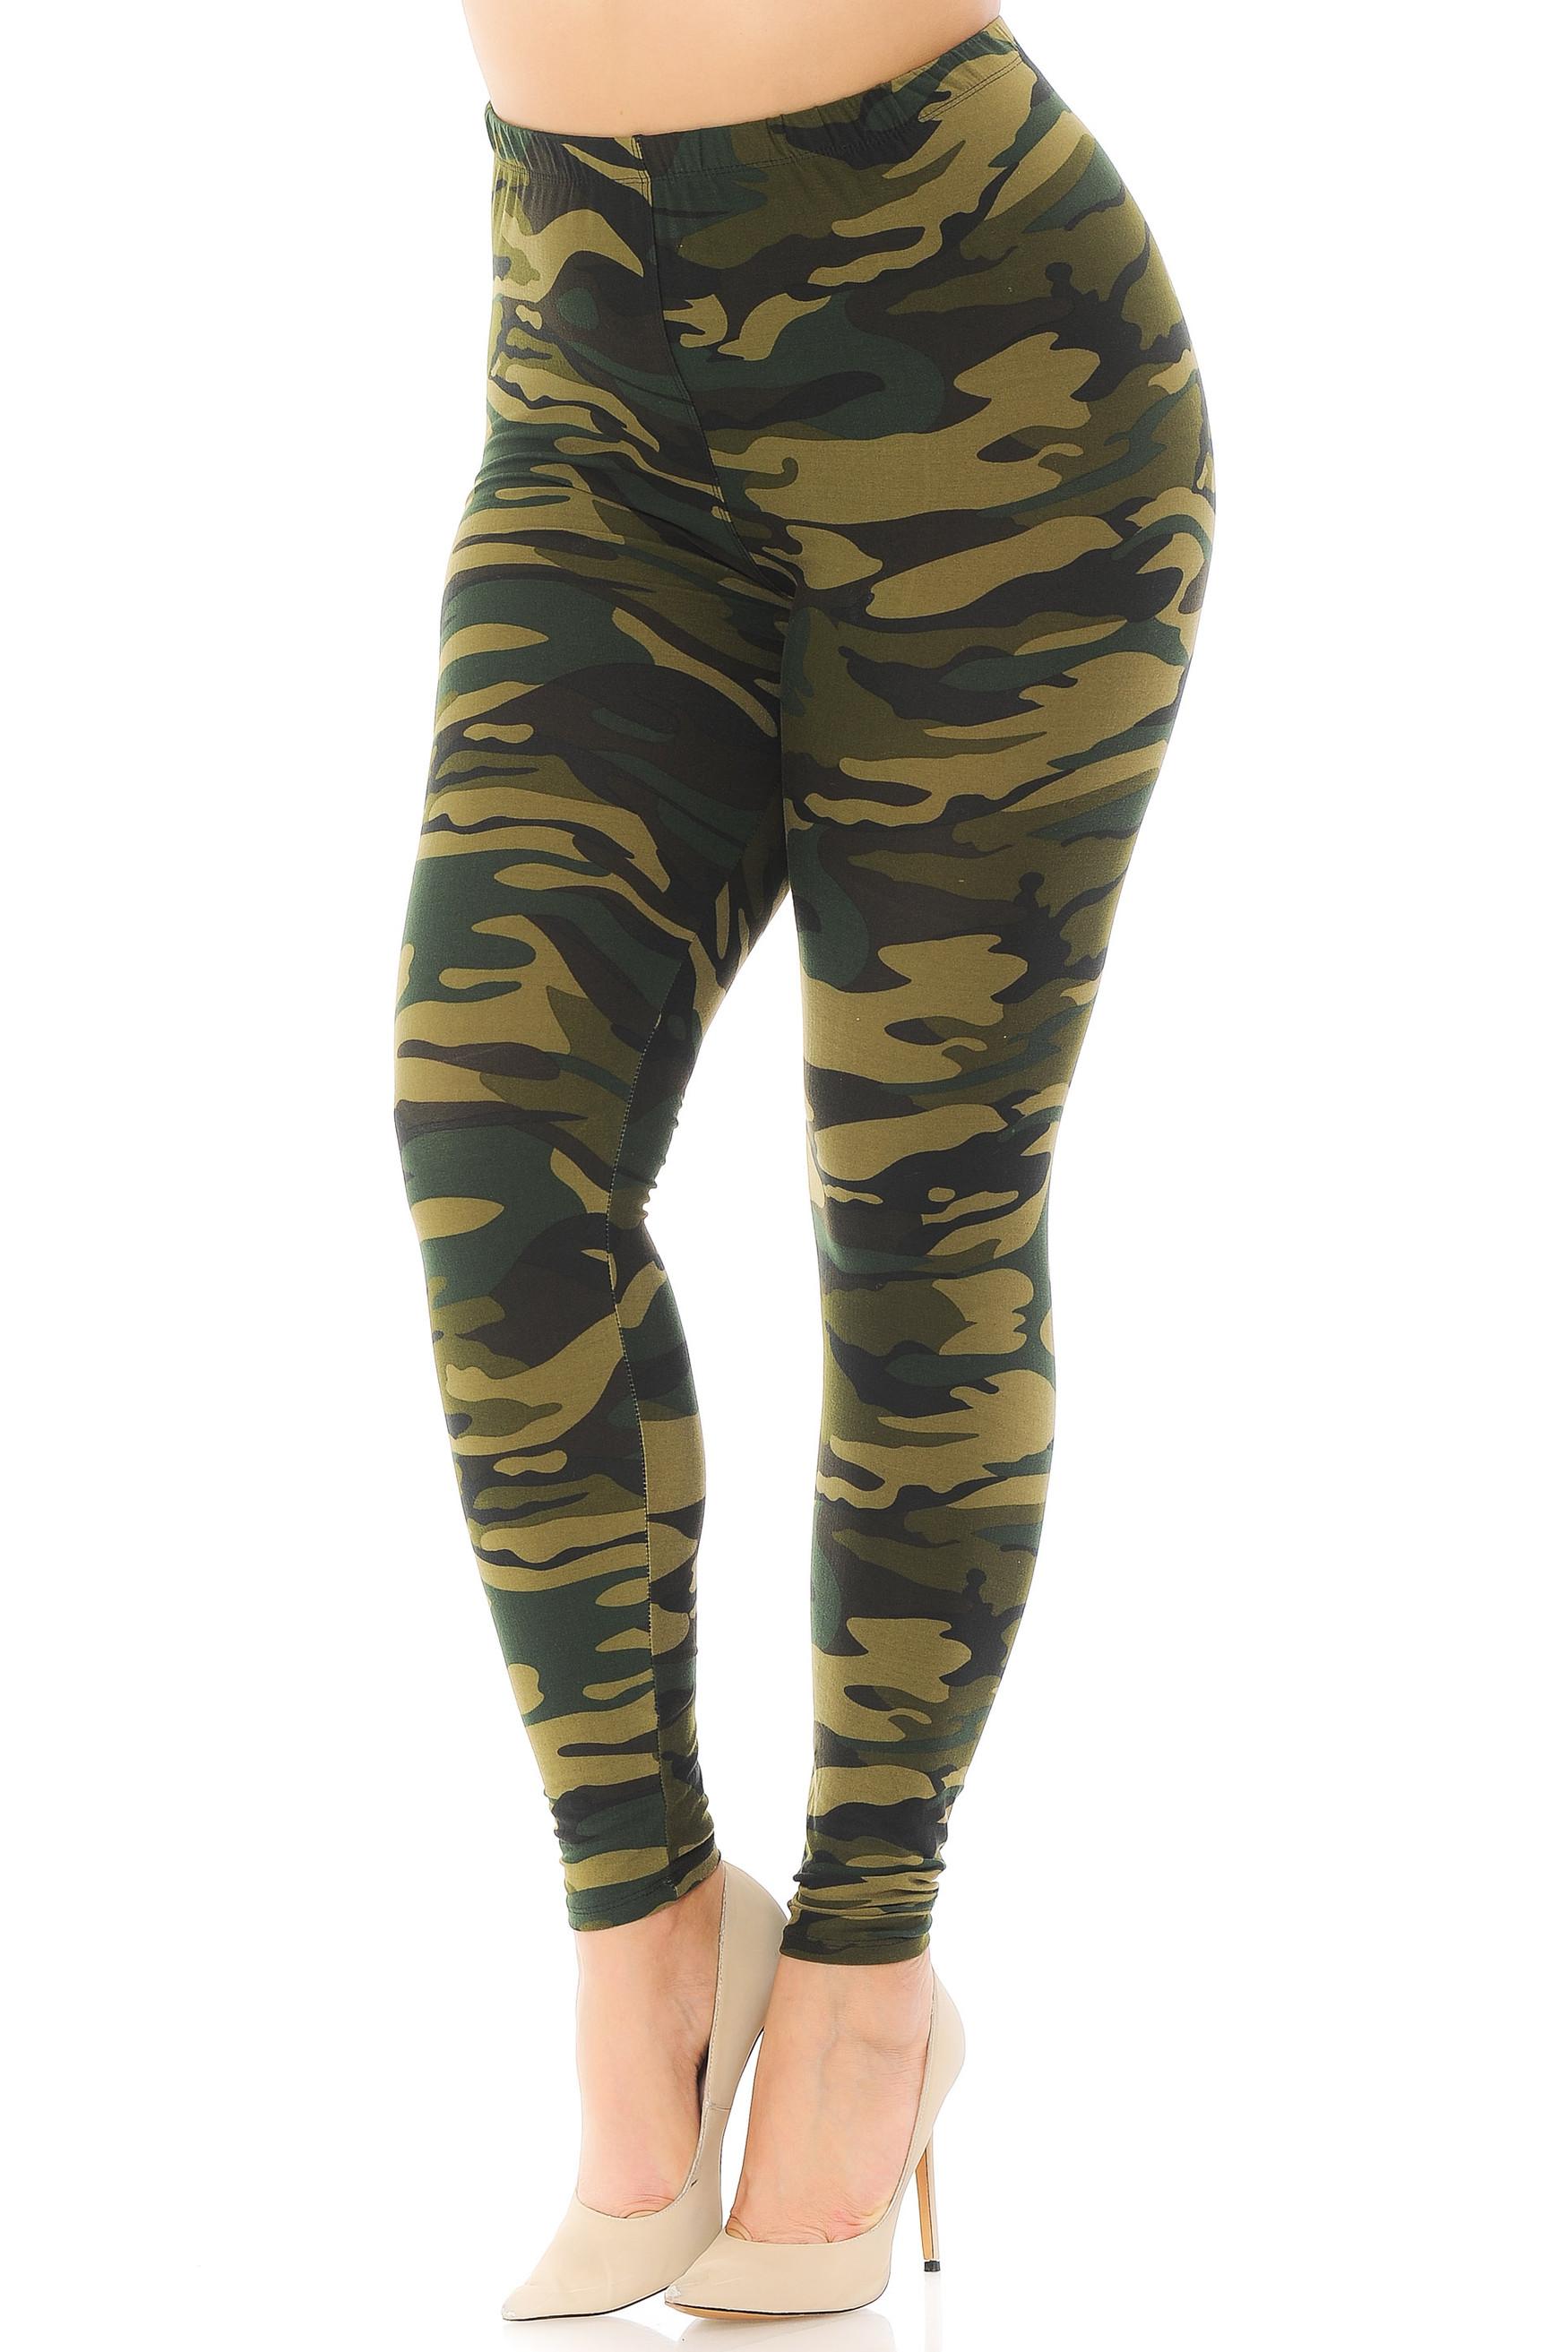 Brushed  Green Camouflage Plus Size Leggings